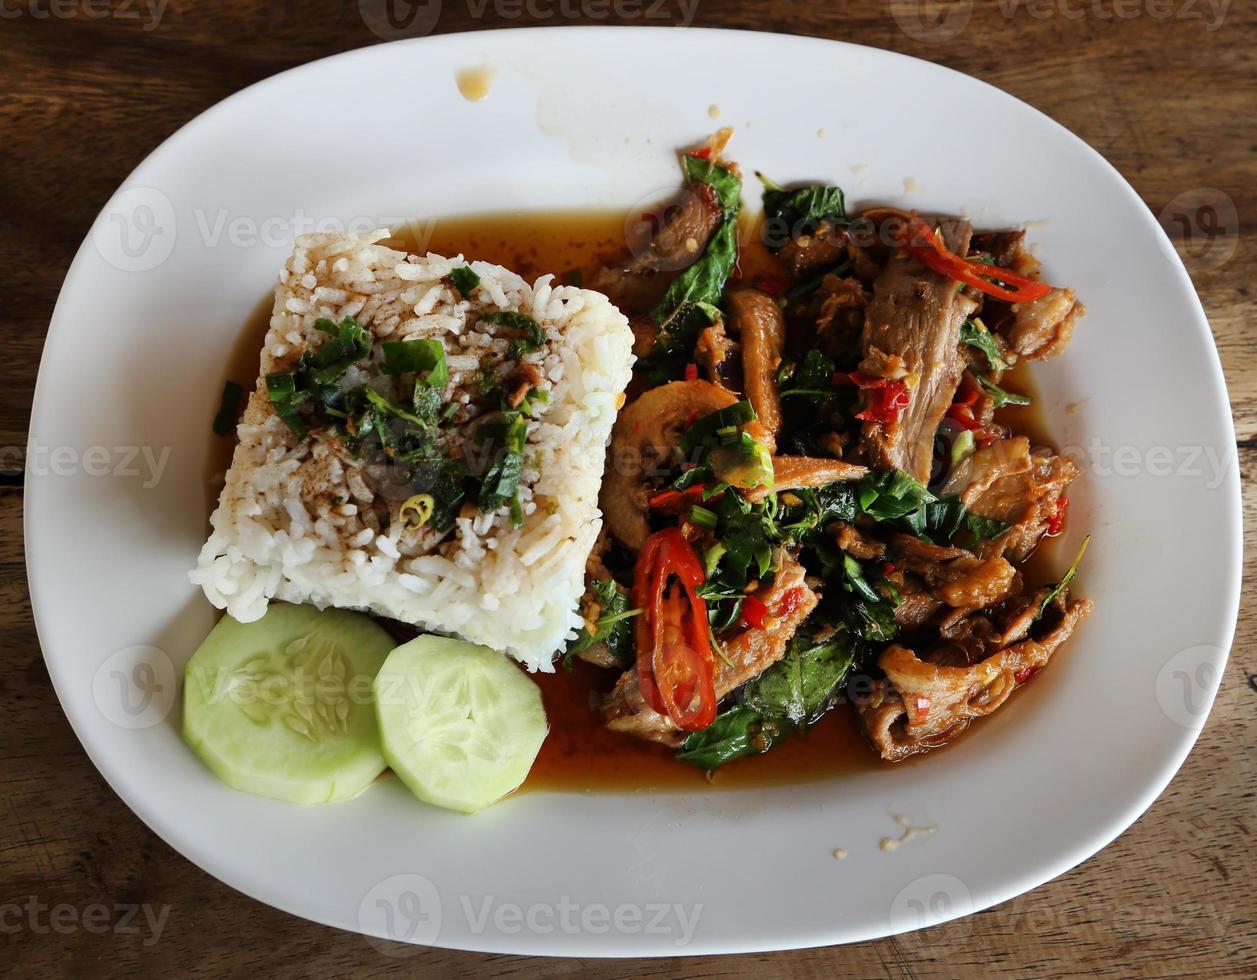 carne de cerdo frita con arroz dulce de jazmín blanco y basi dulce foto